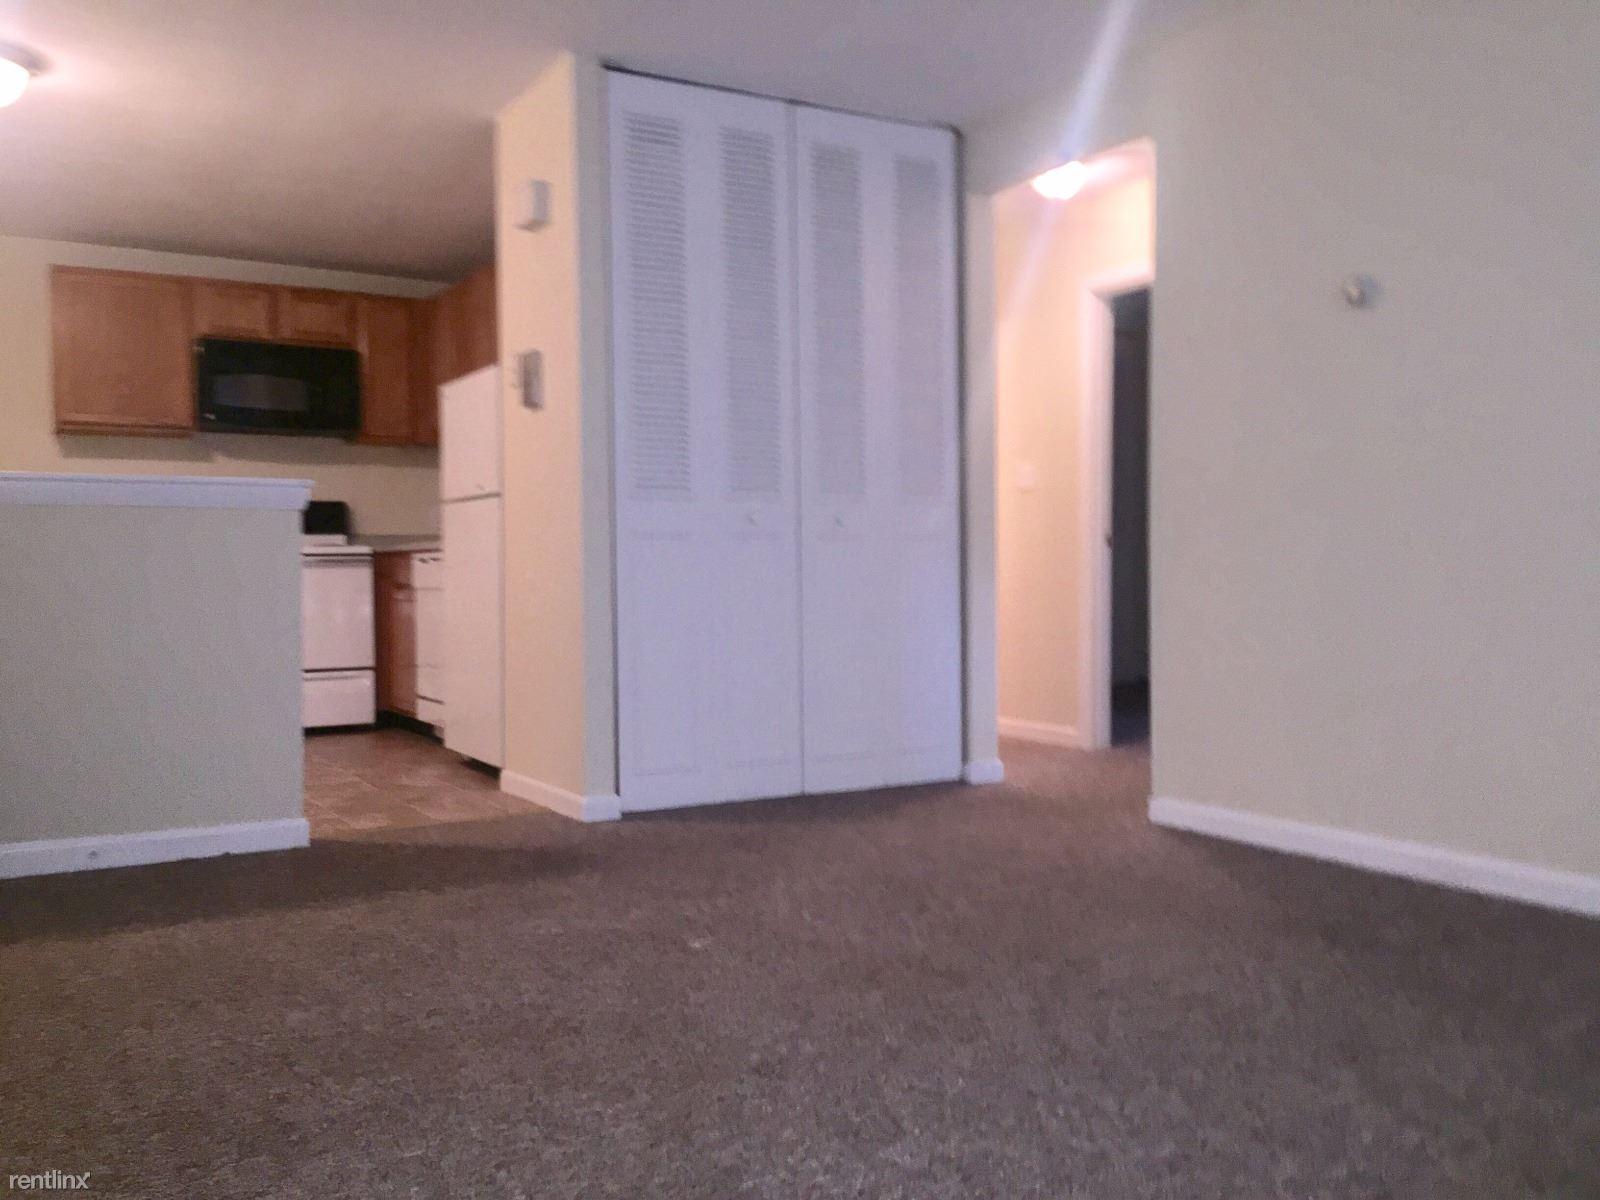 315 Revere St, Canton, MA - $1,650